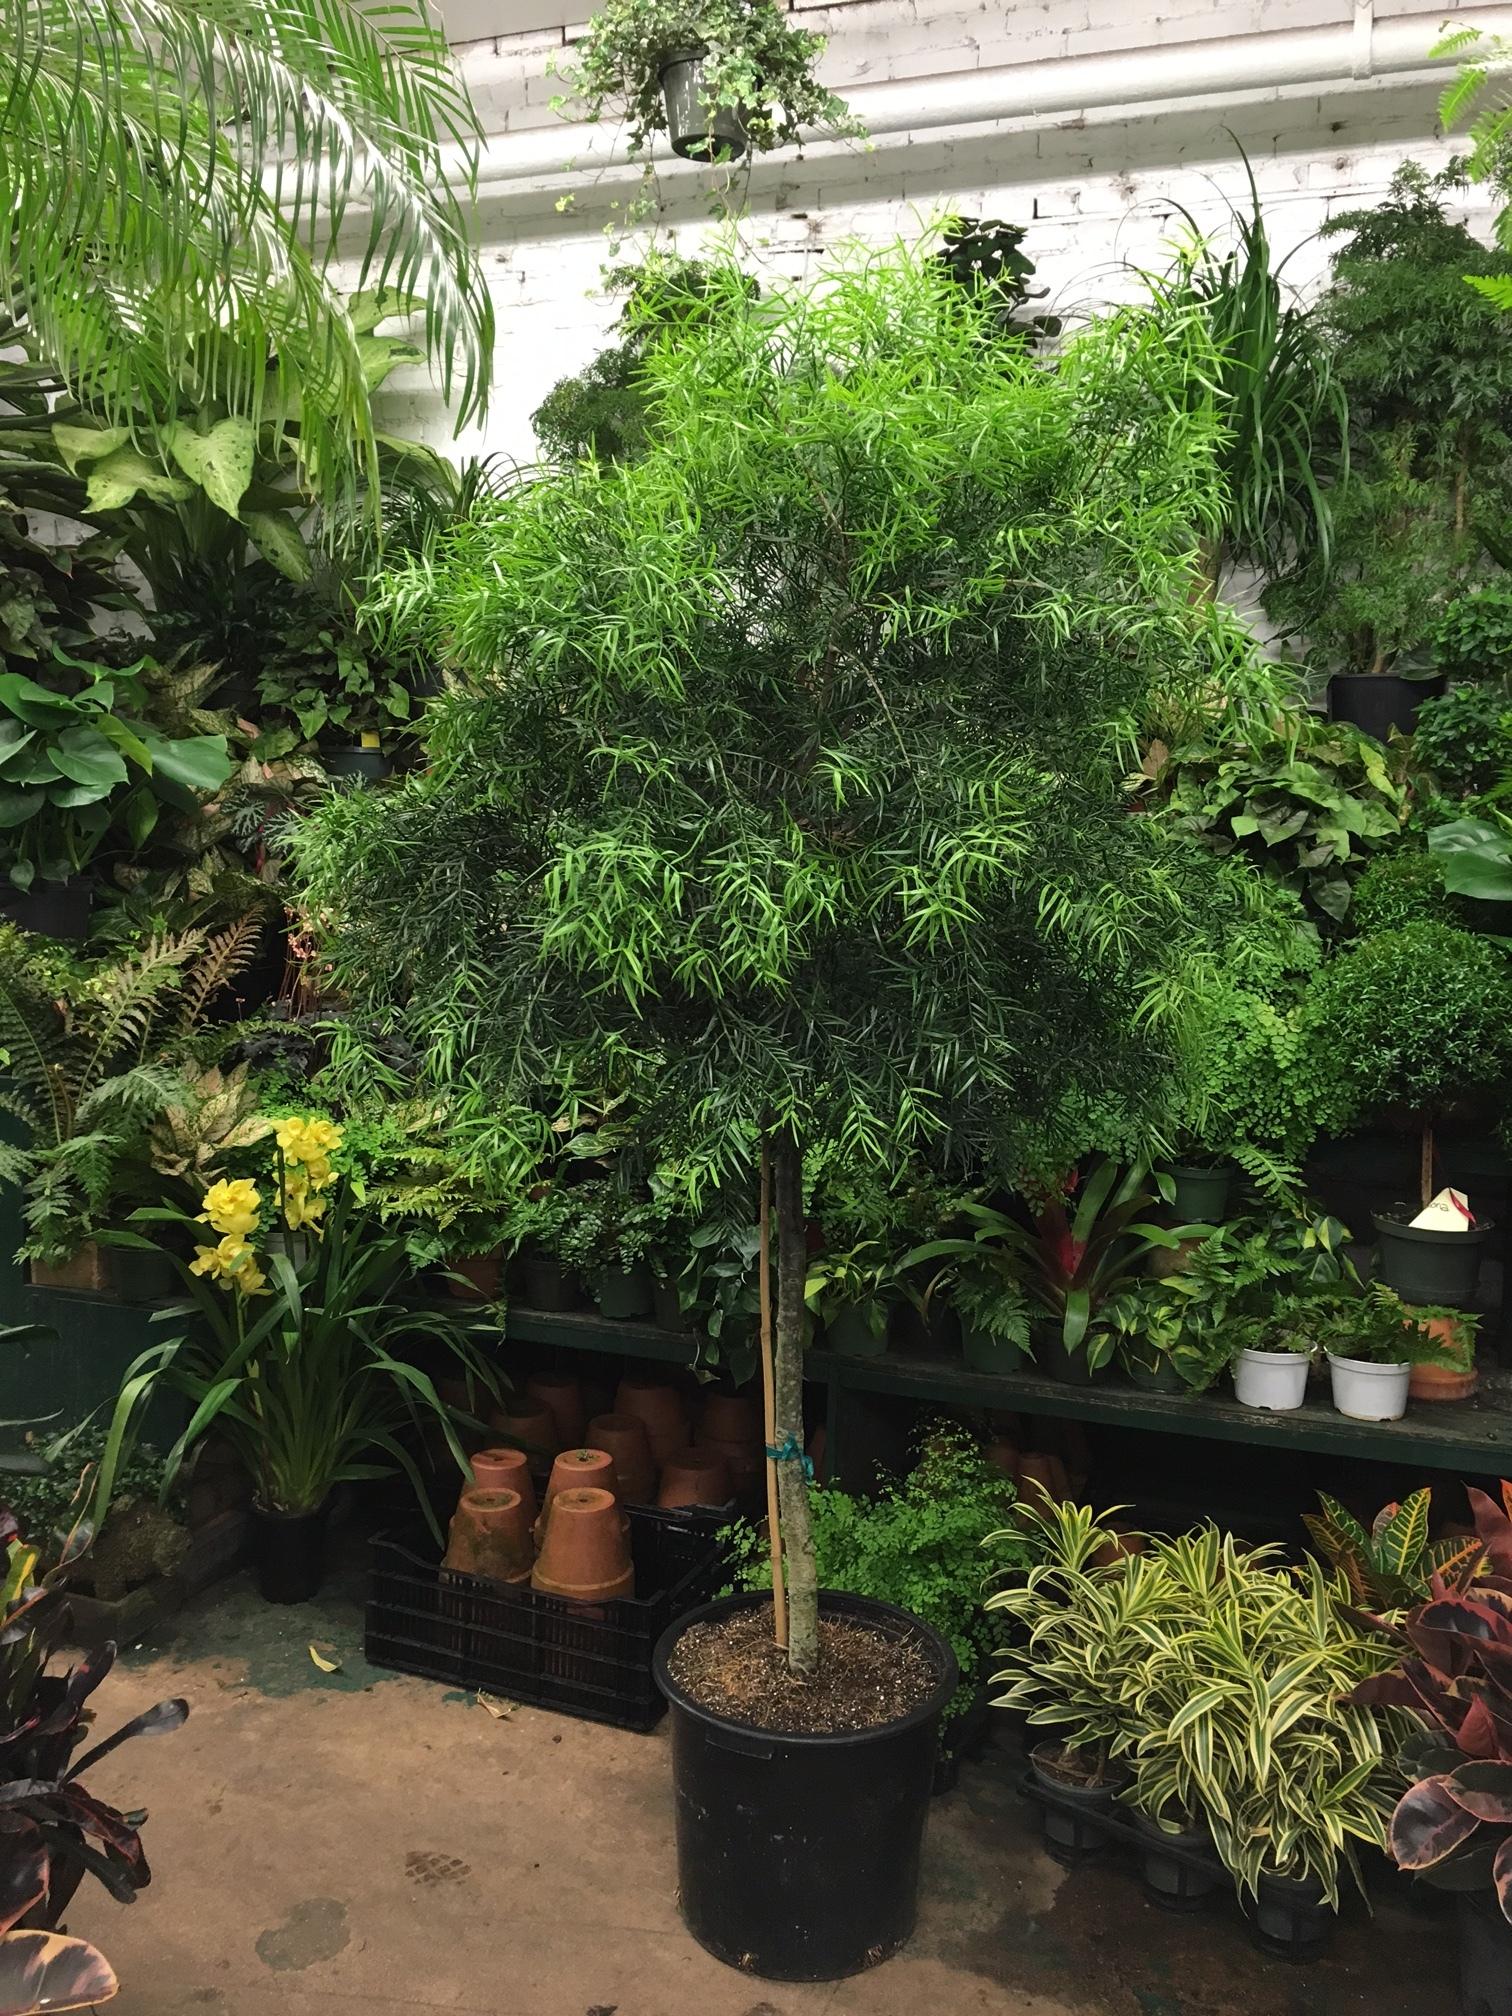 podecarpus, african fern pine or buddhist pine